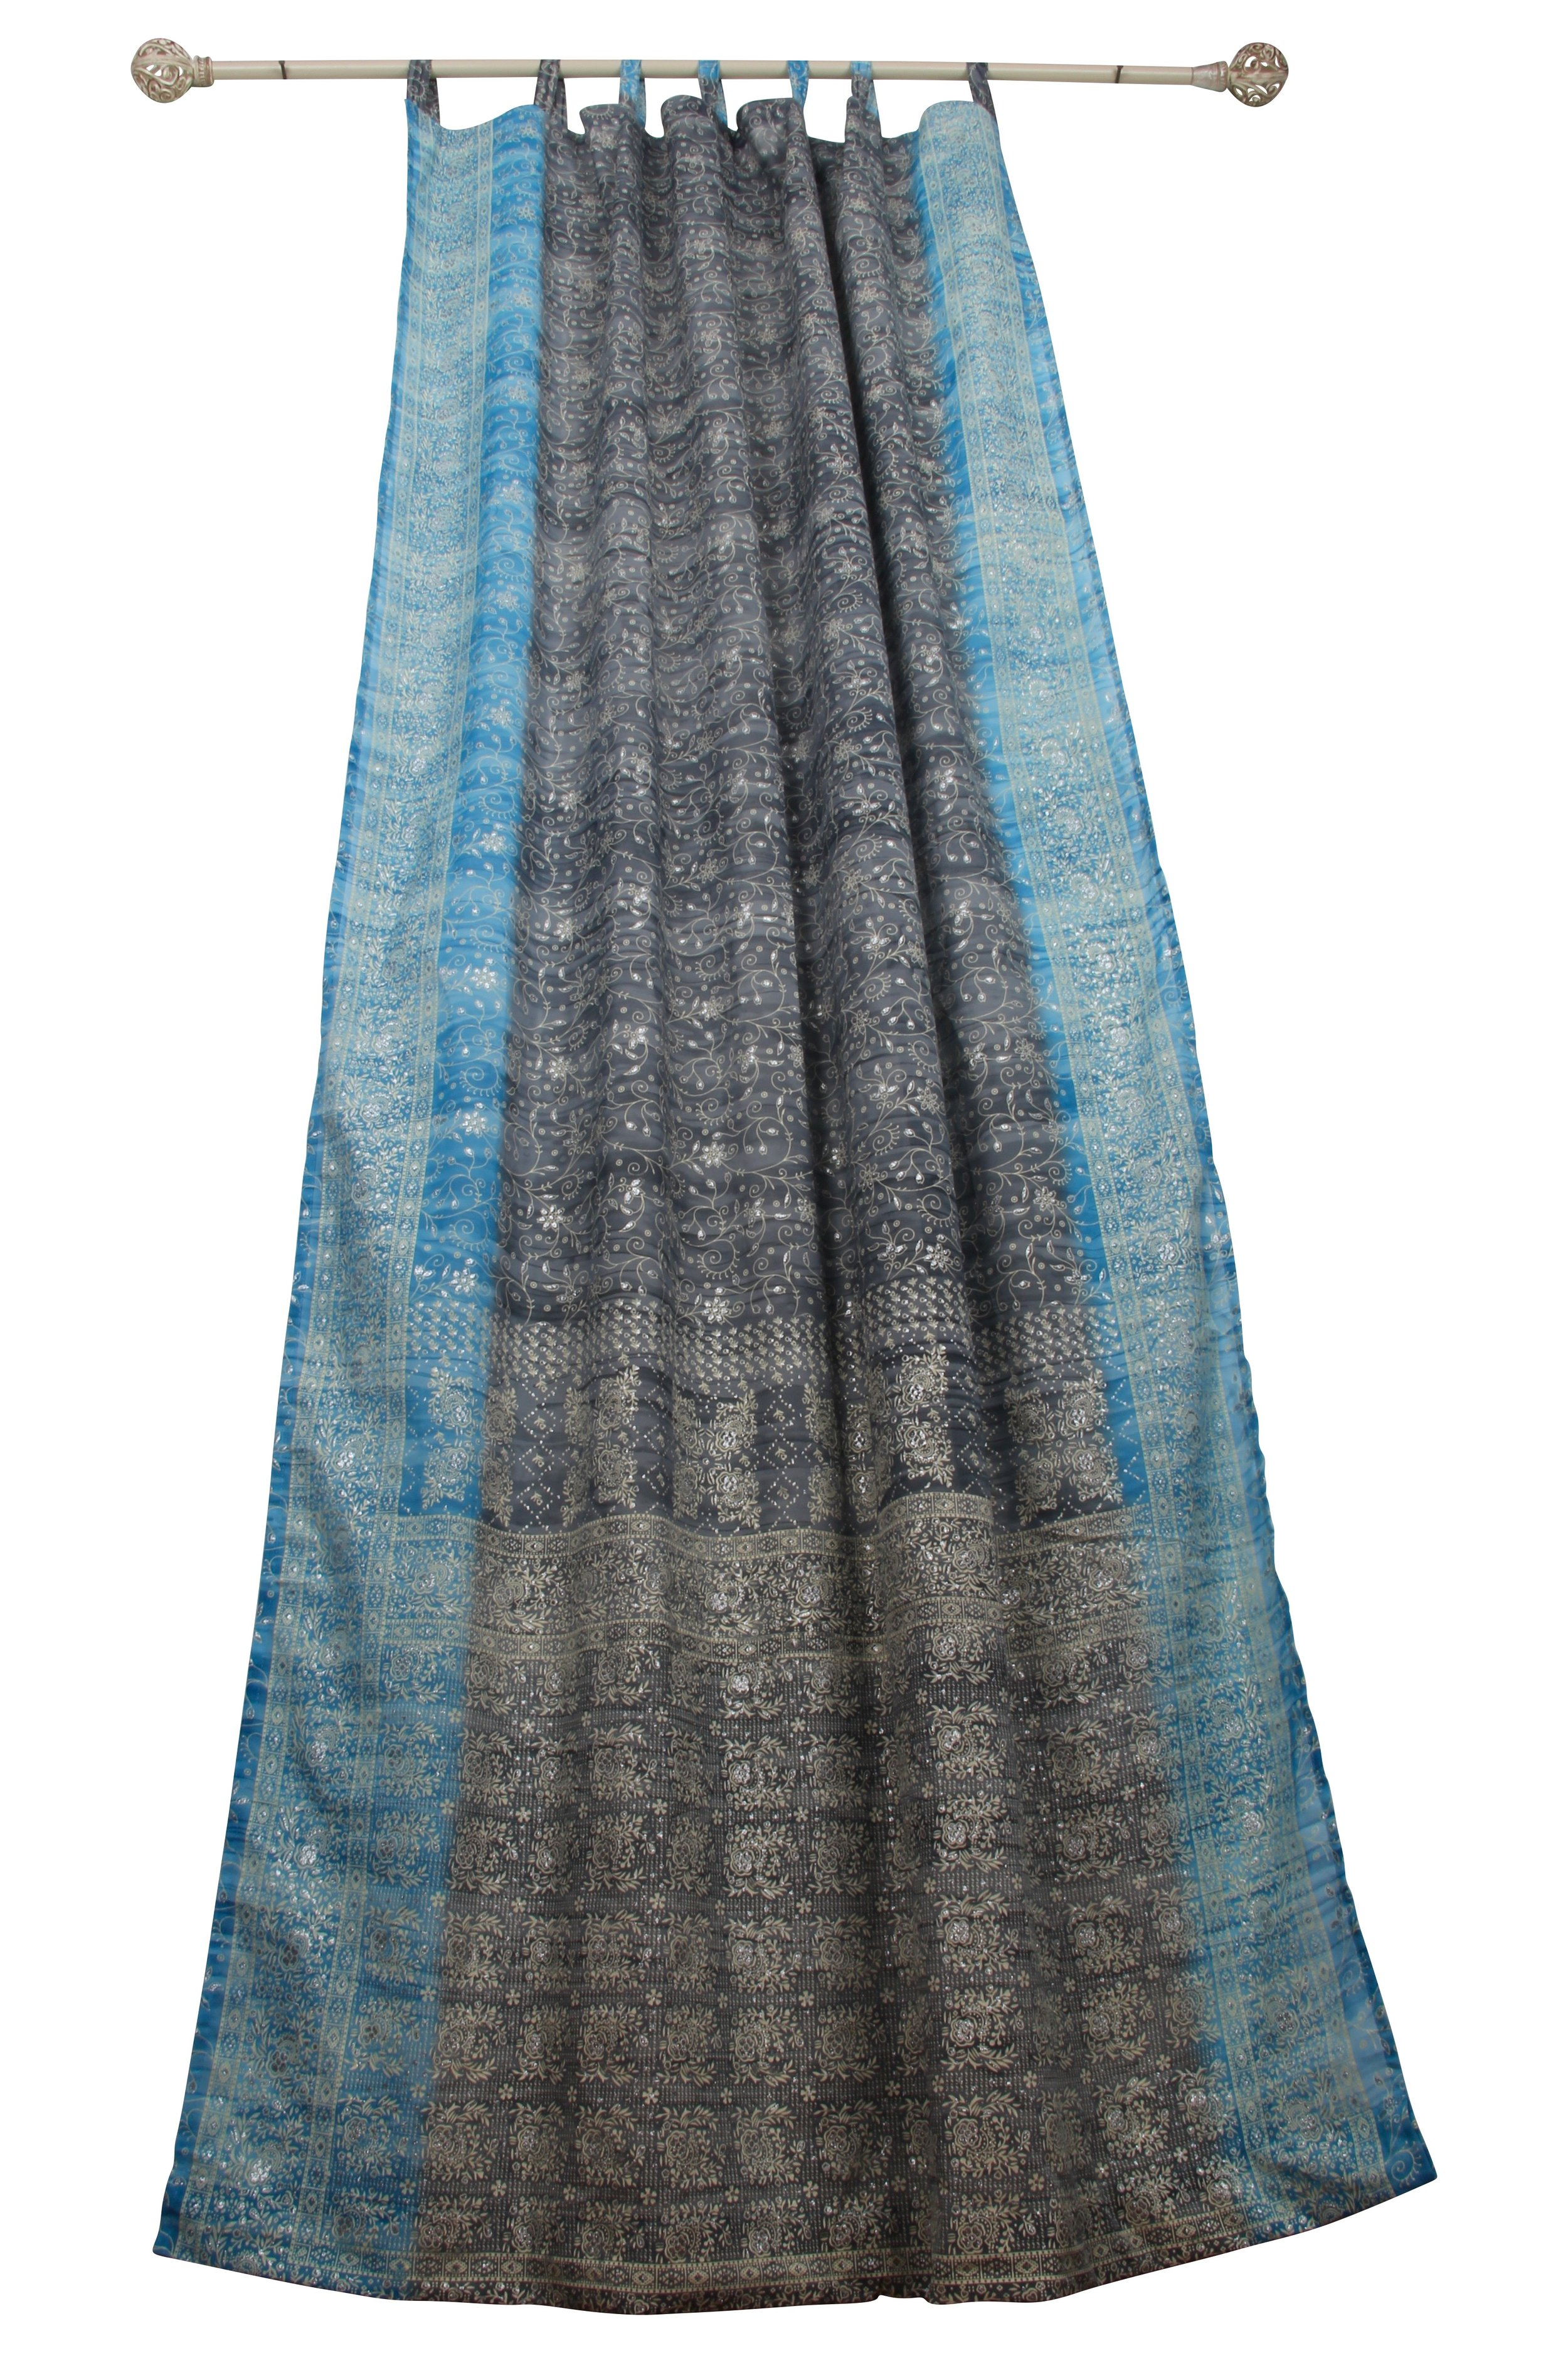 sari window curtain gray turquoise colors by padmini